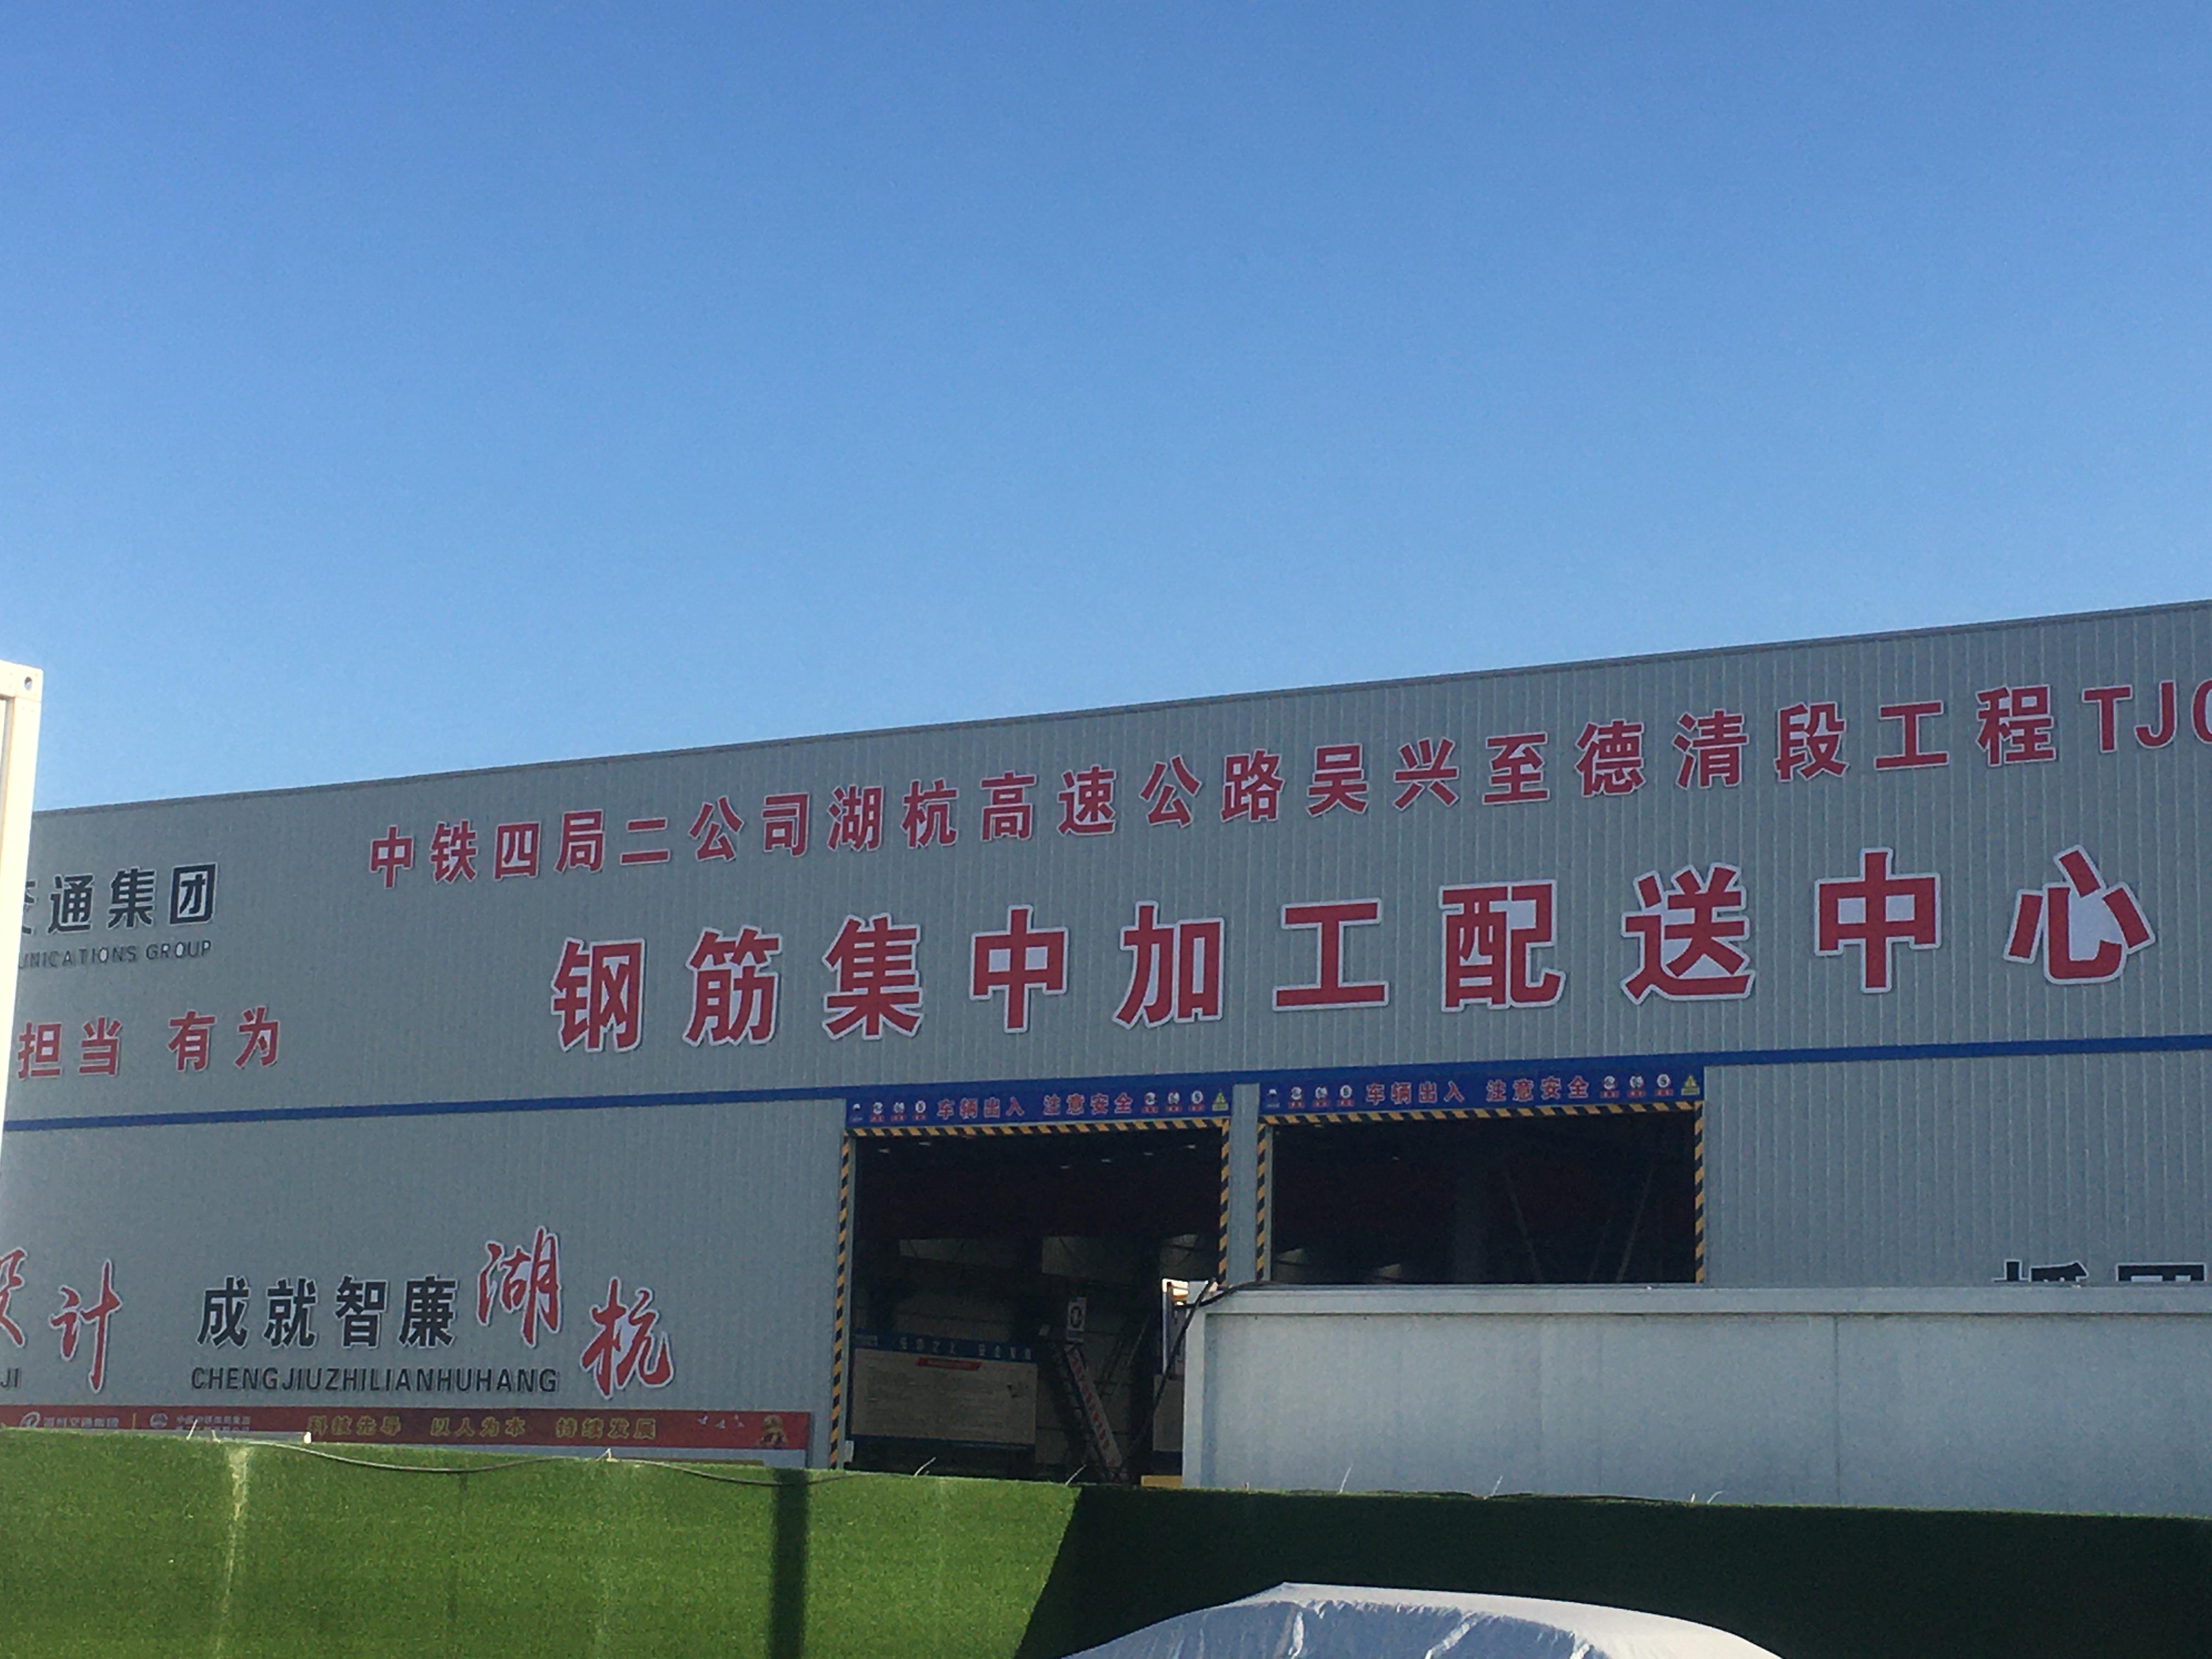 https://www.hnglgroup.com/upload/中铁四局二公司湖杭高速3标钢筋加工厂.jpg